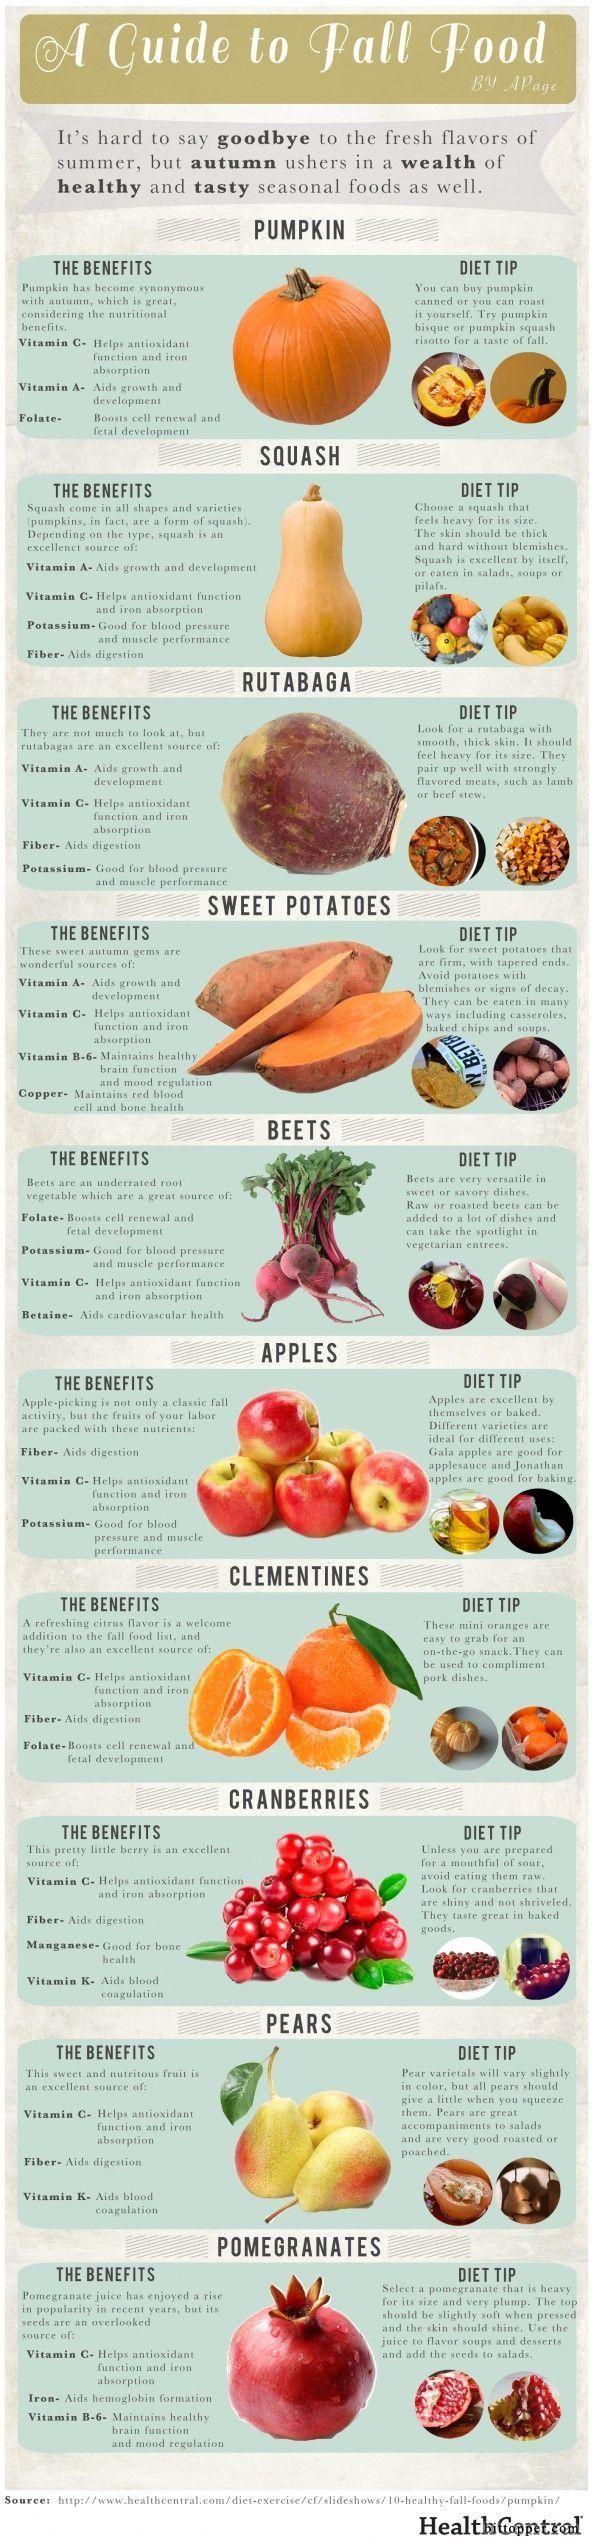 Healthy Fall (Autumn) food